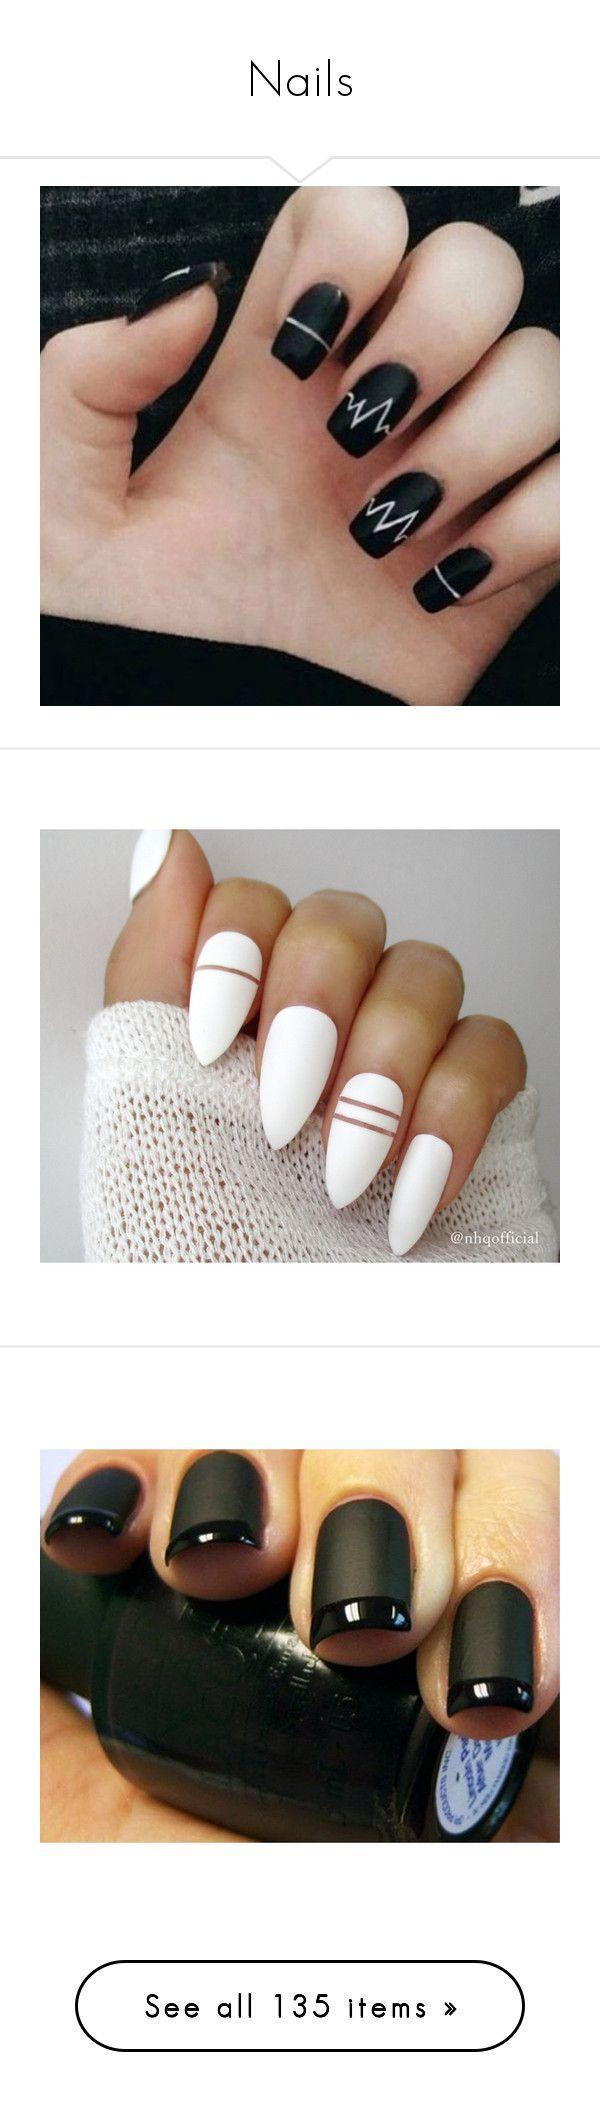 """Nails"" by emo-kyleigh ❤ liked on Polyvore featuring nails, beauty products, nail care, nail treatments, makeup, beauty, nail polish, filler, nail art and lip makeup"